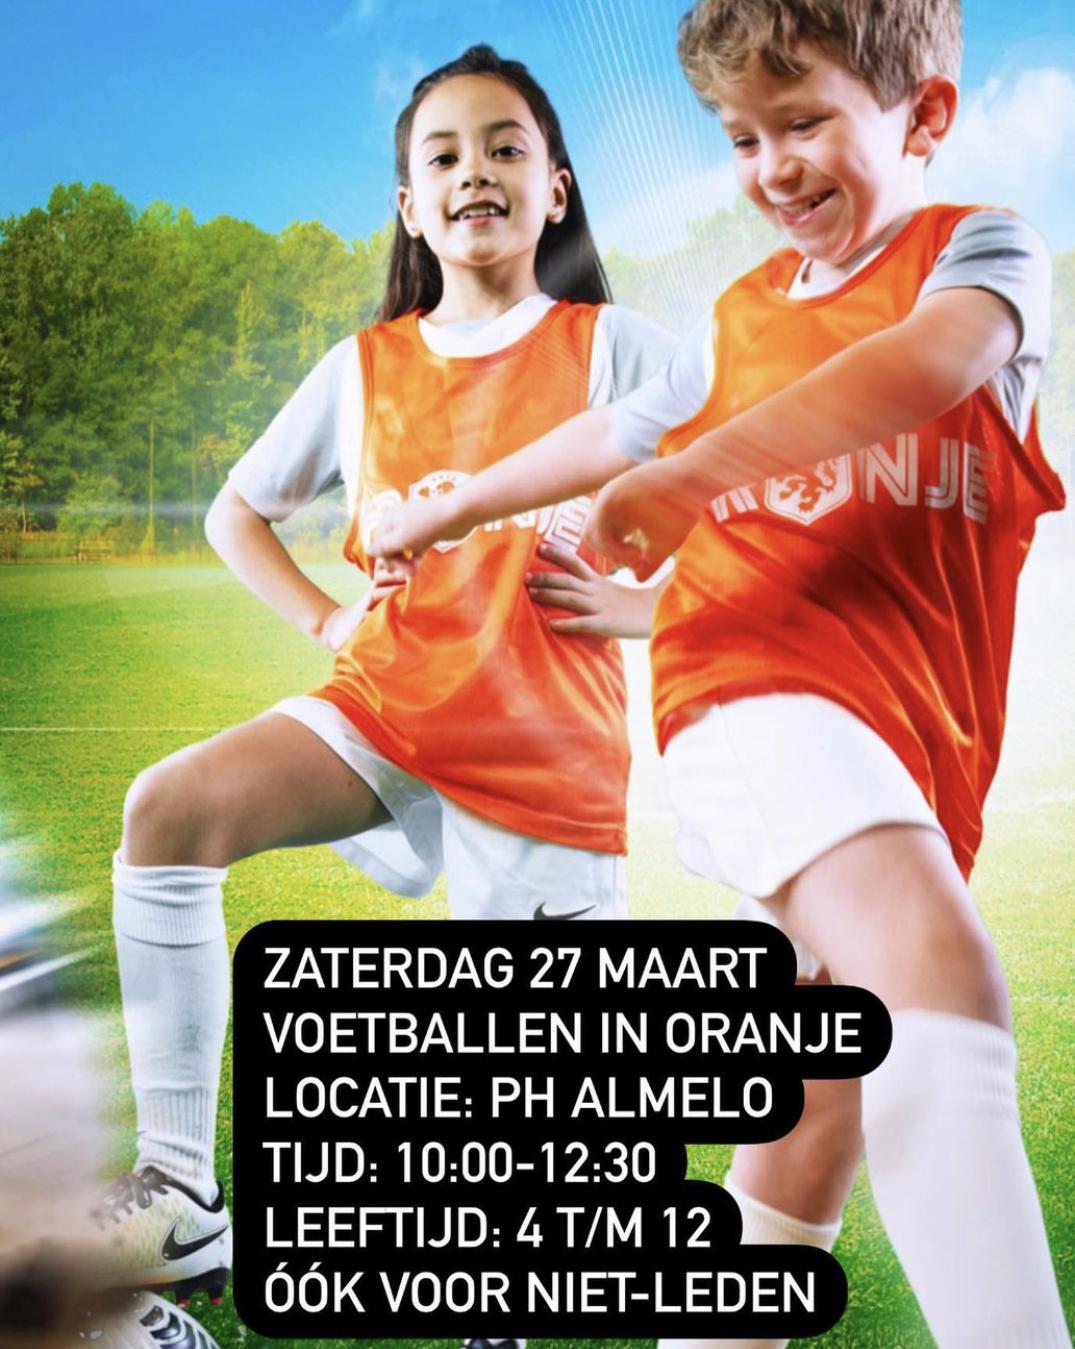 PH Almelo Organiseert Uniek Oranjefestival